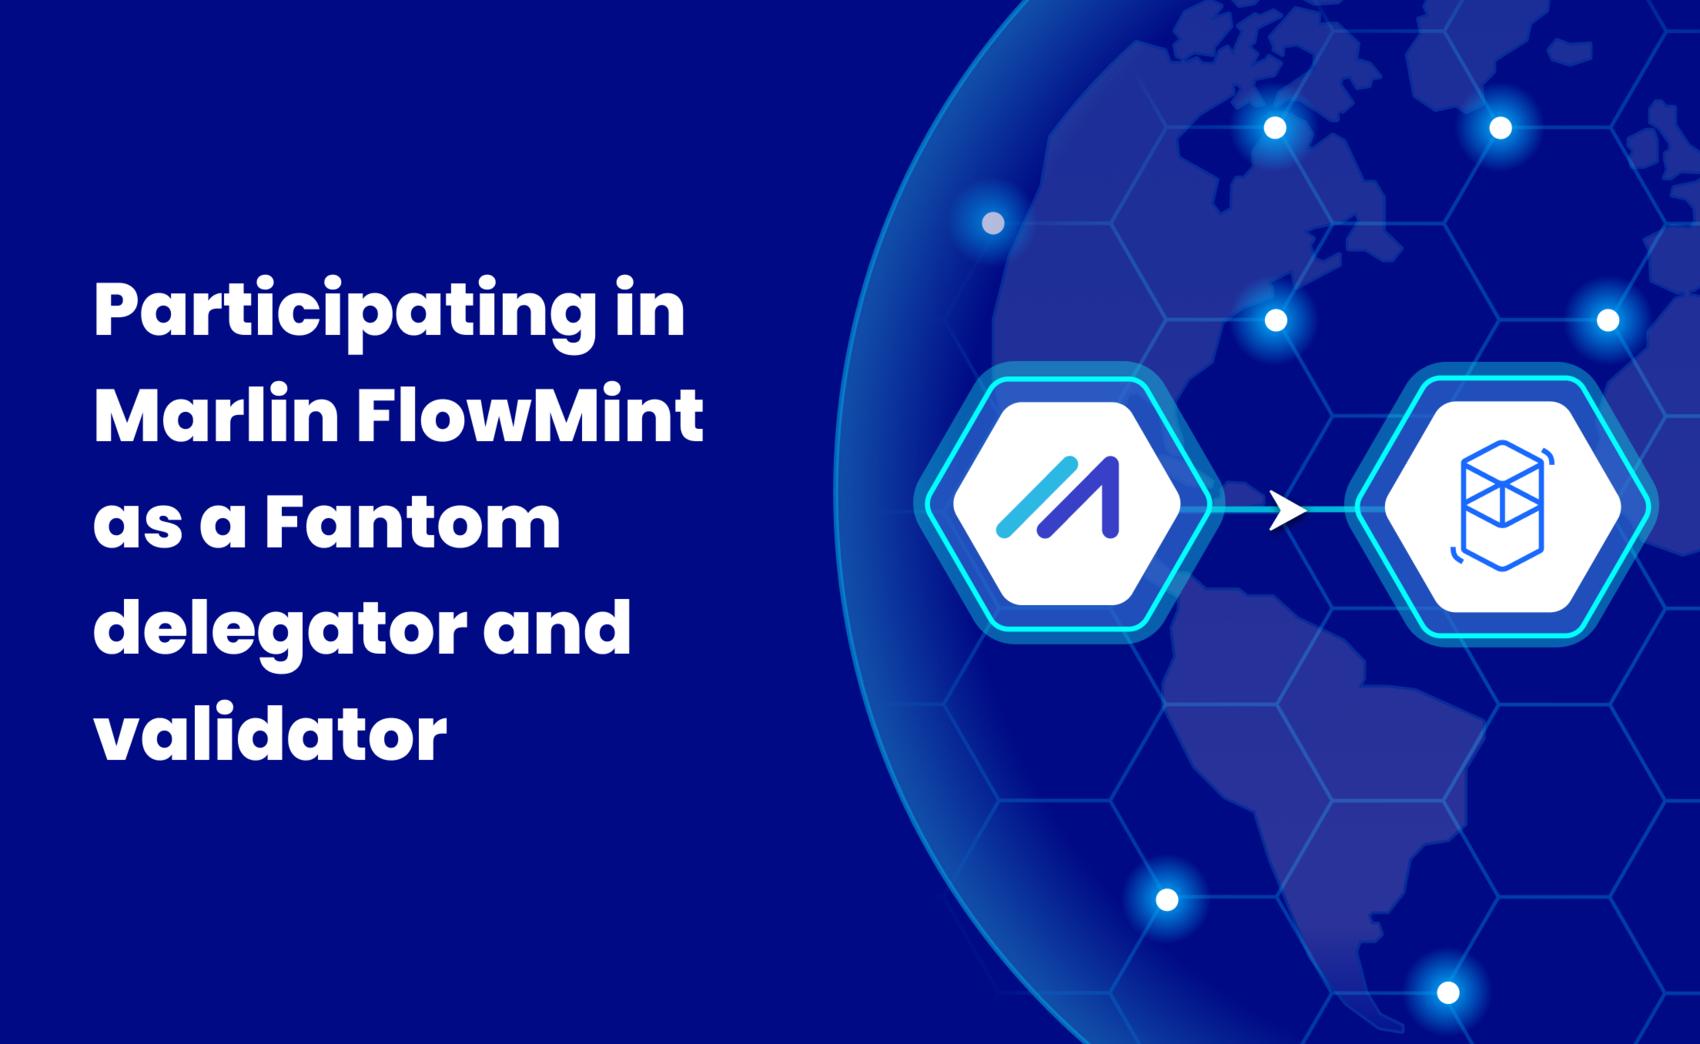 Participating in Marlin FlowMint as a Fantom delegator and validator